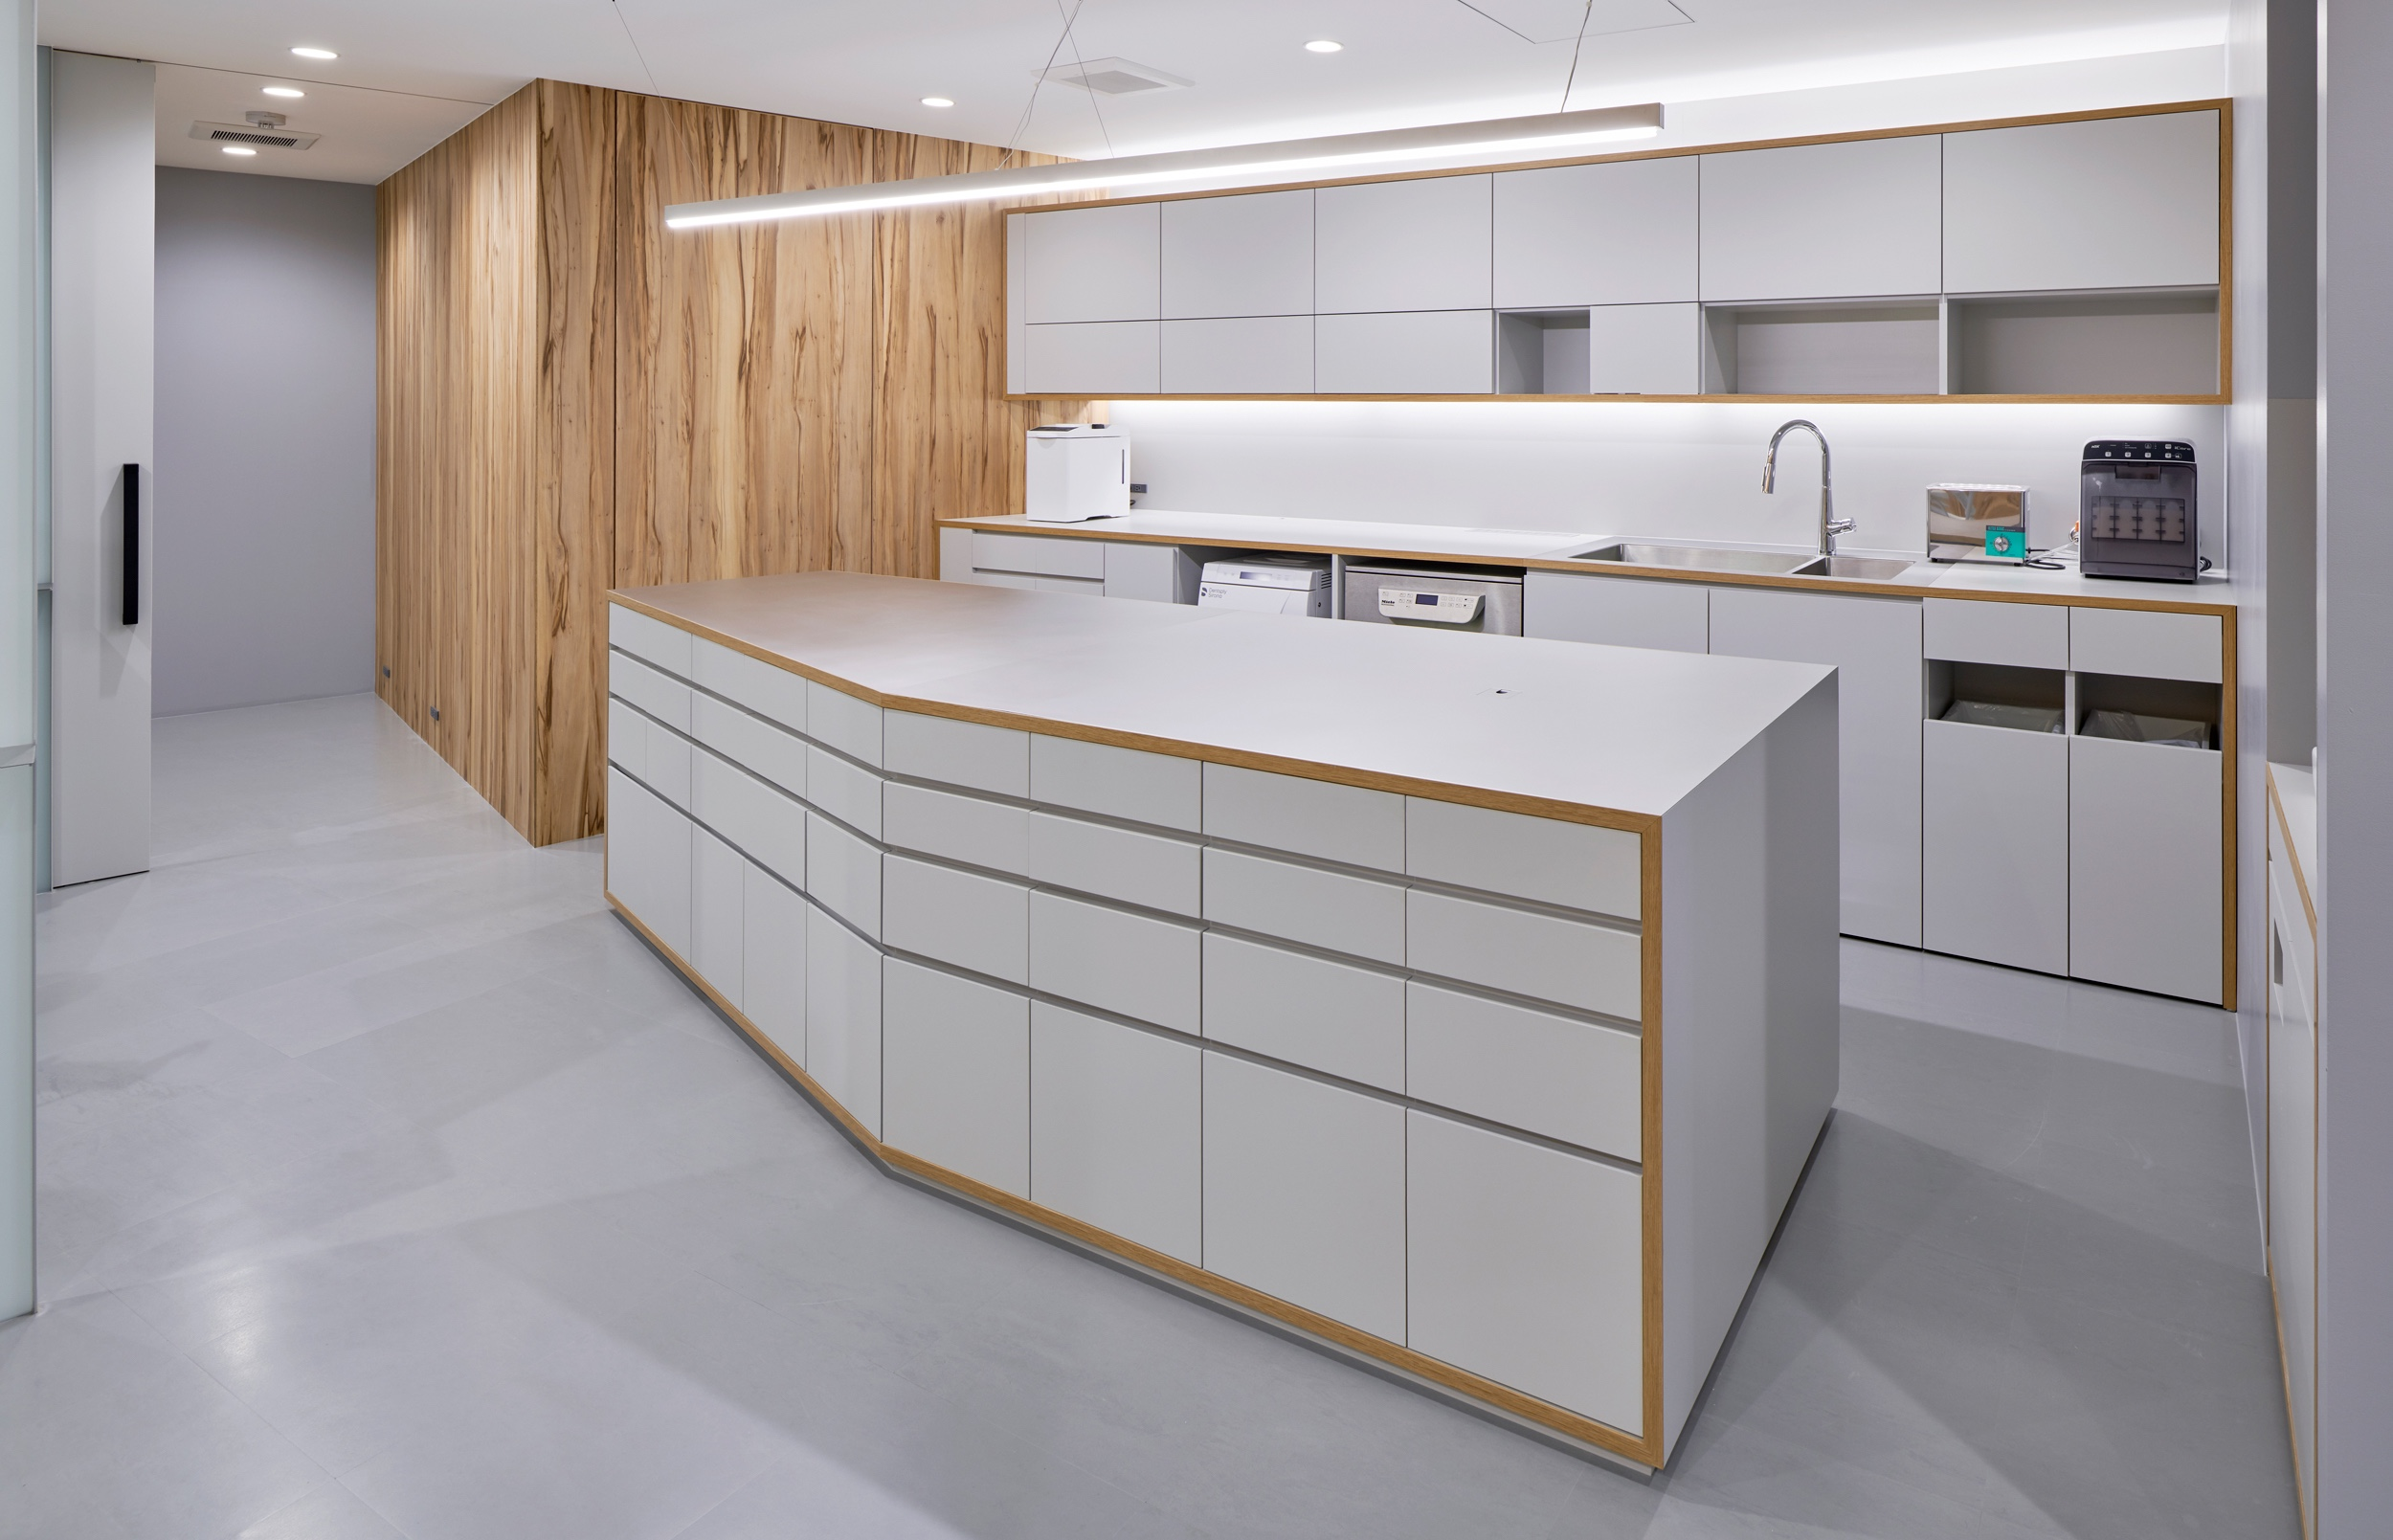 Kimura Dental Clinic 22s ©Takeshi Asano 2019